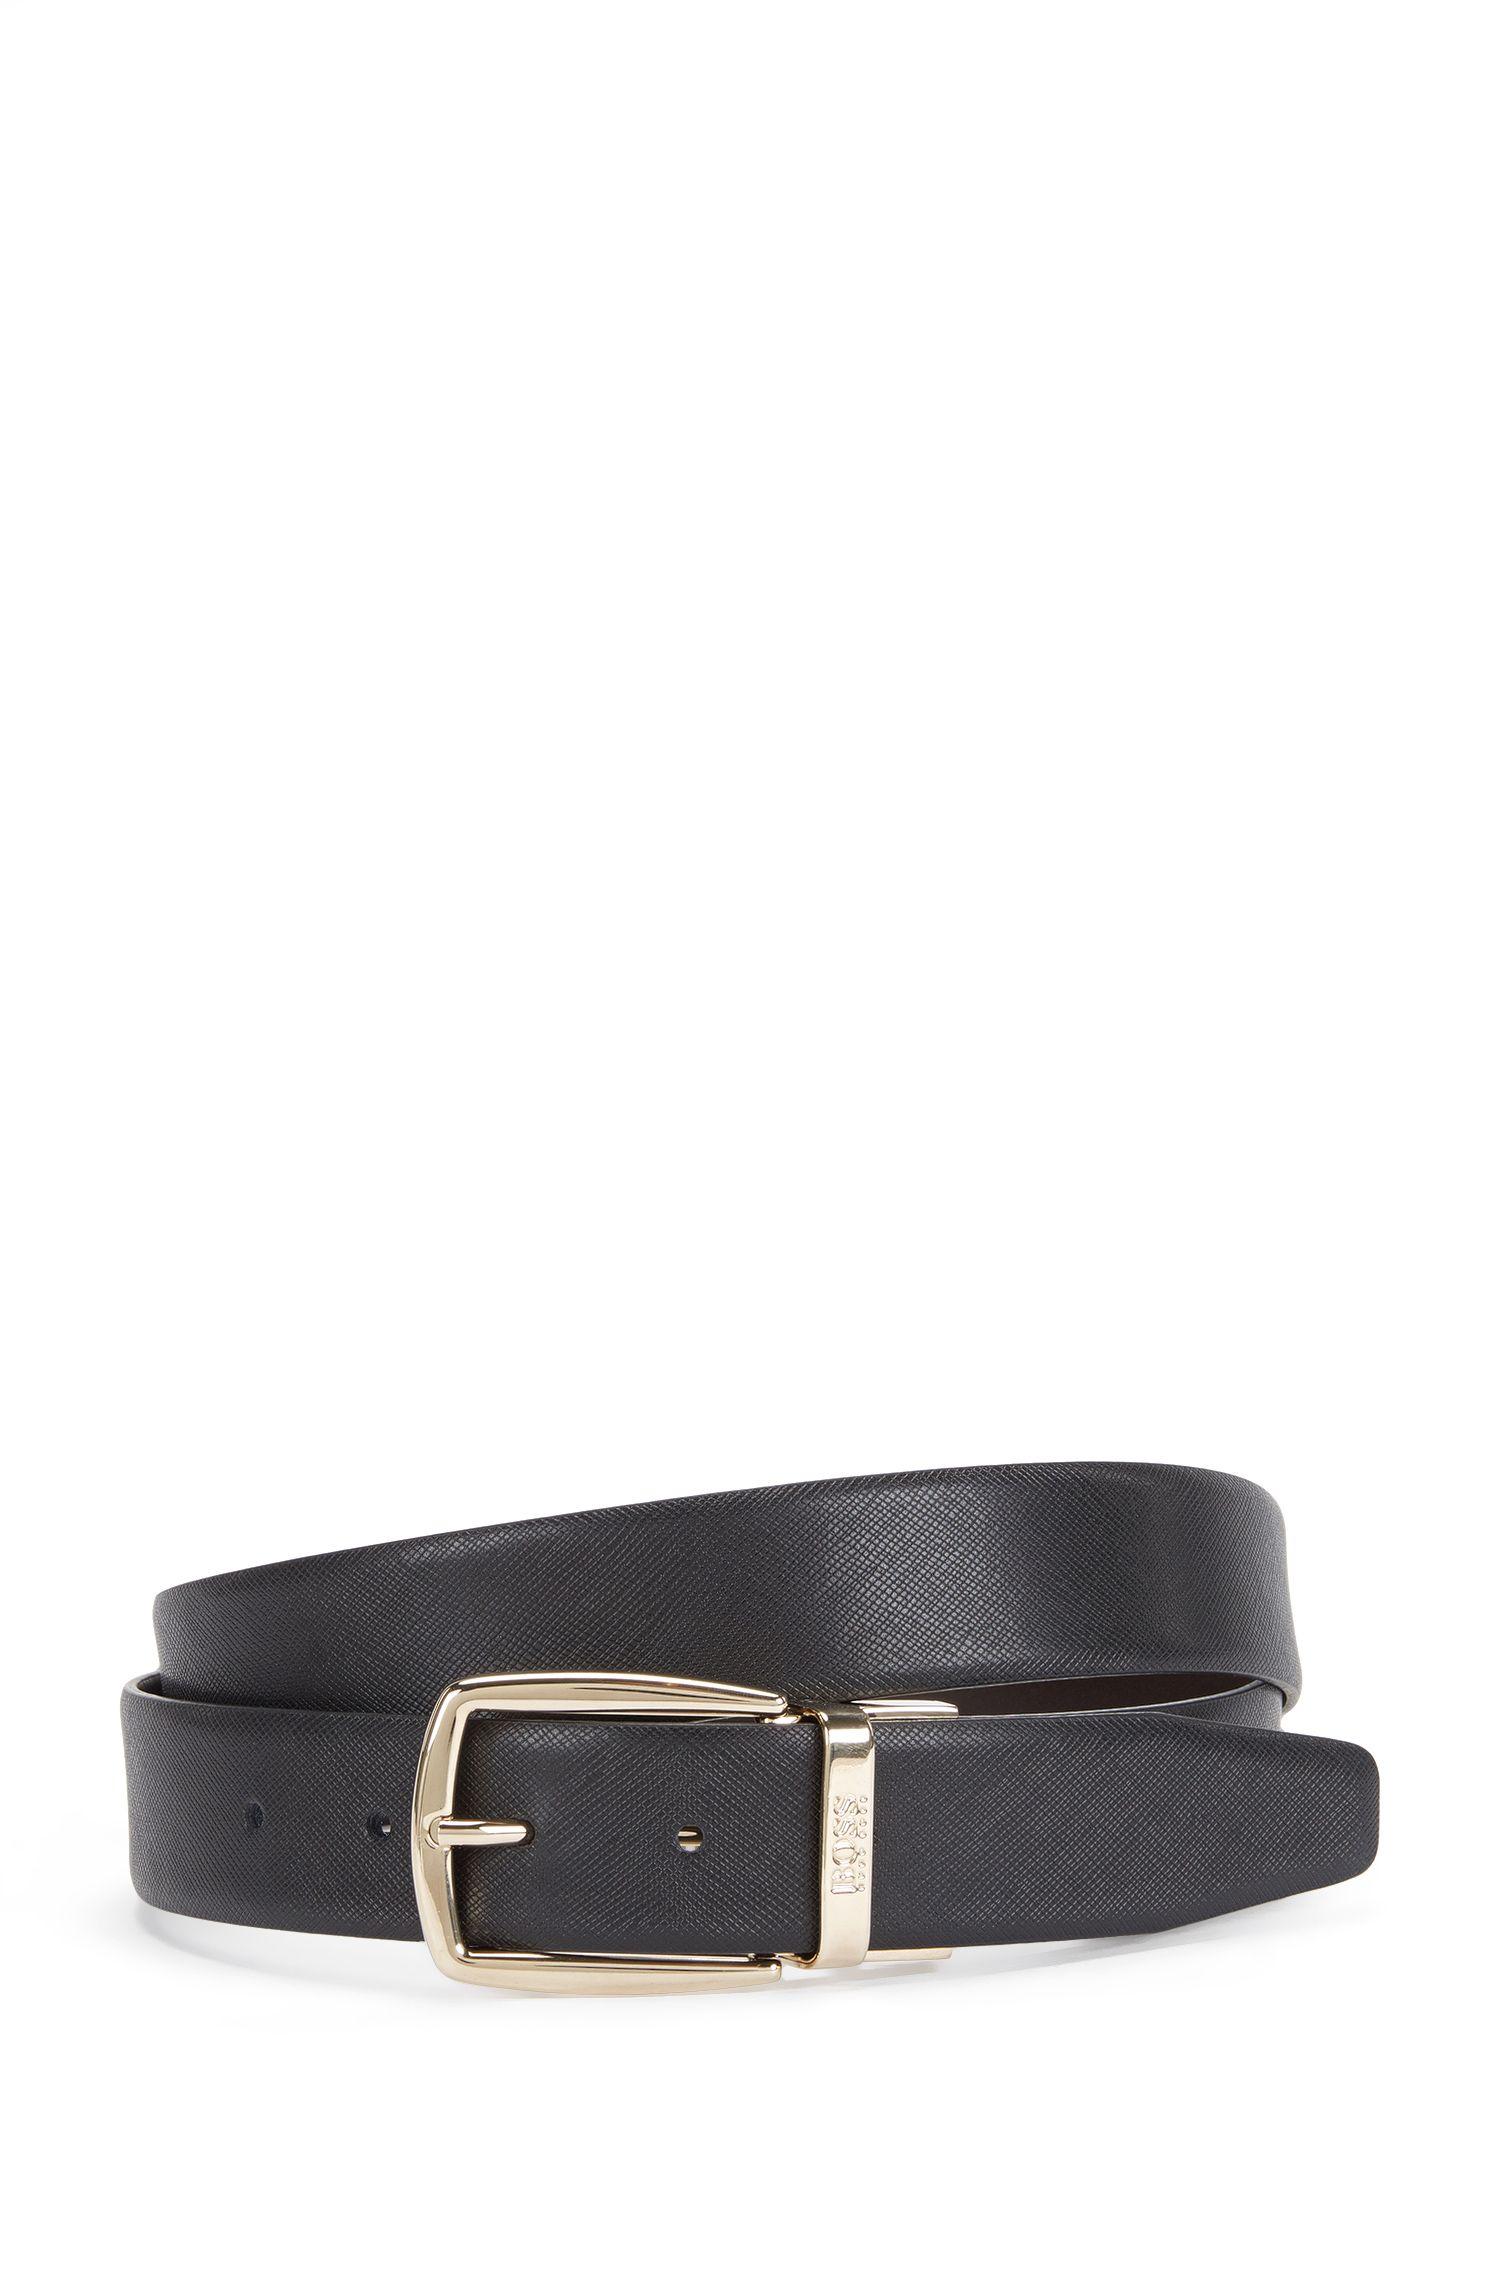 'Otardos-CN' | Reversible Italian Leather Belt